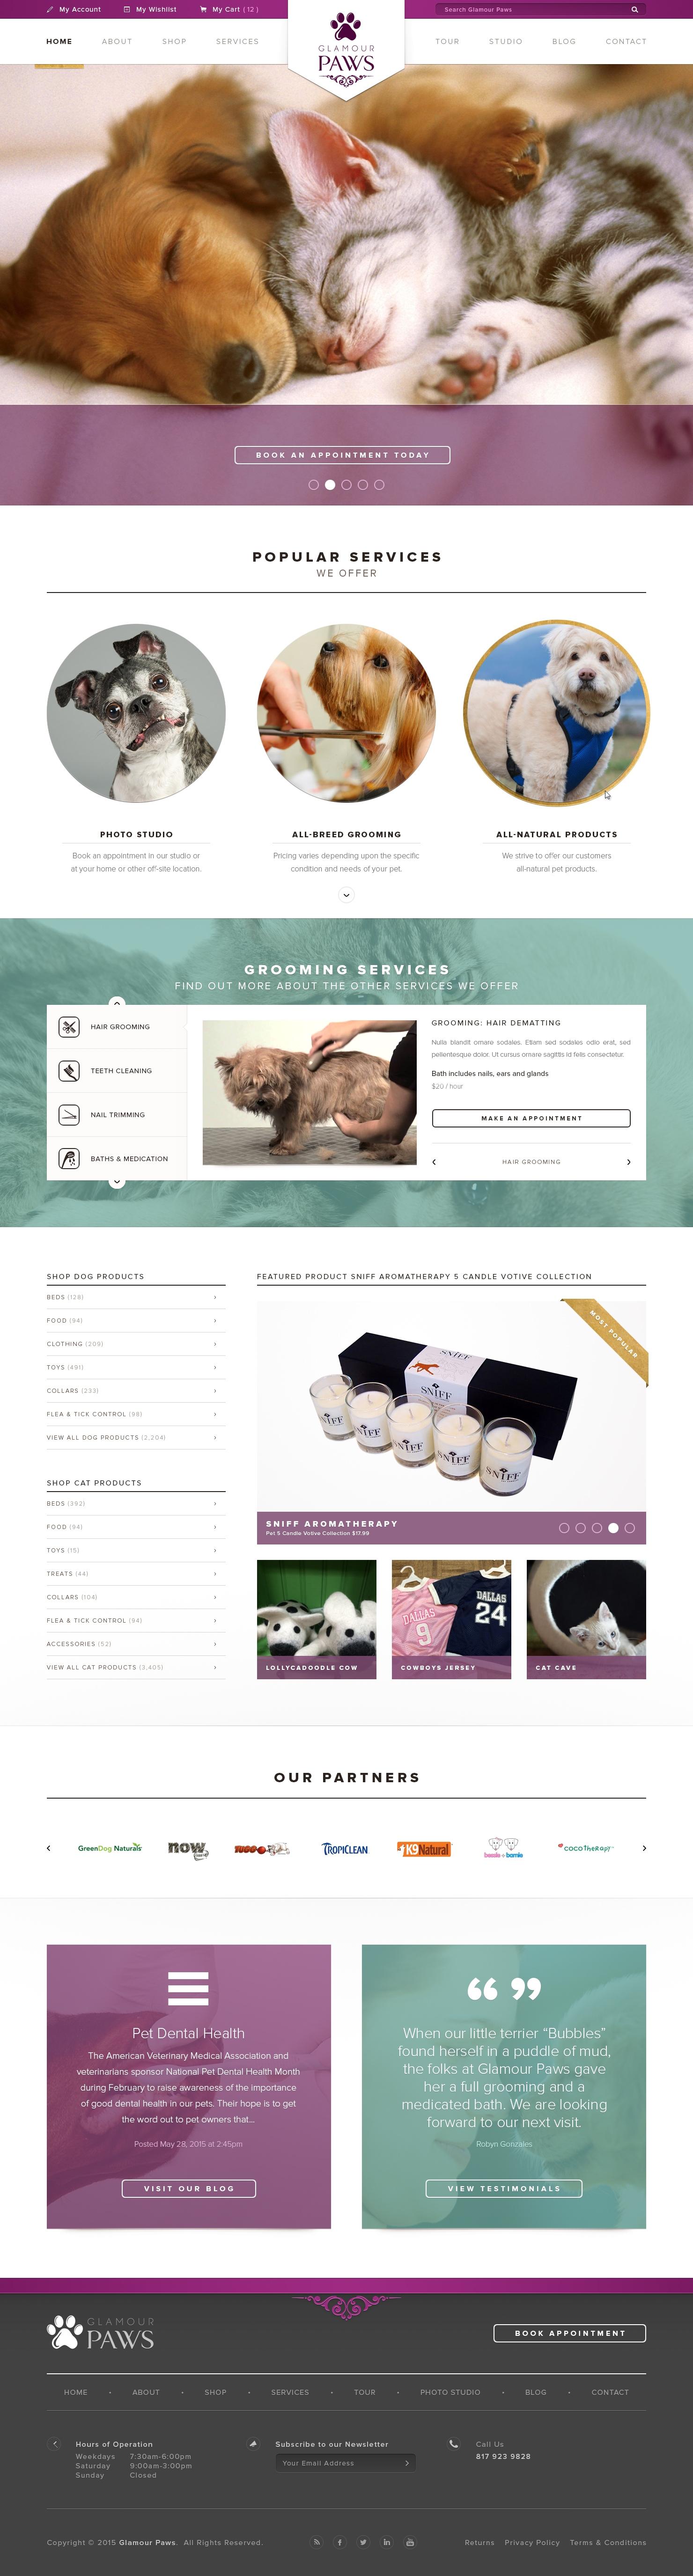 Designs | Pet Boutique & grooming Website Template update ...